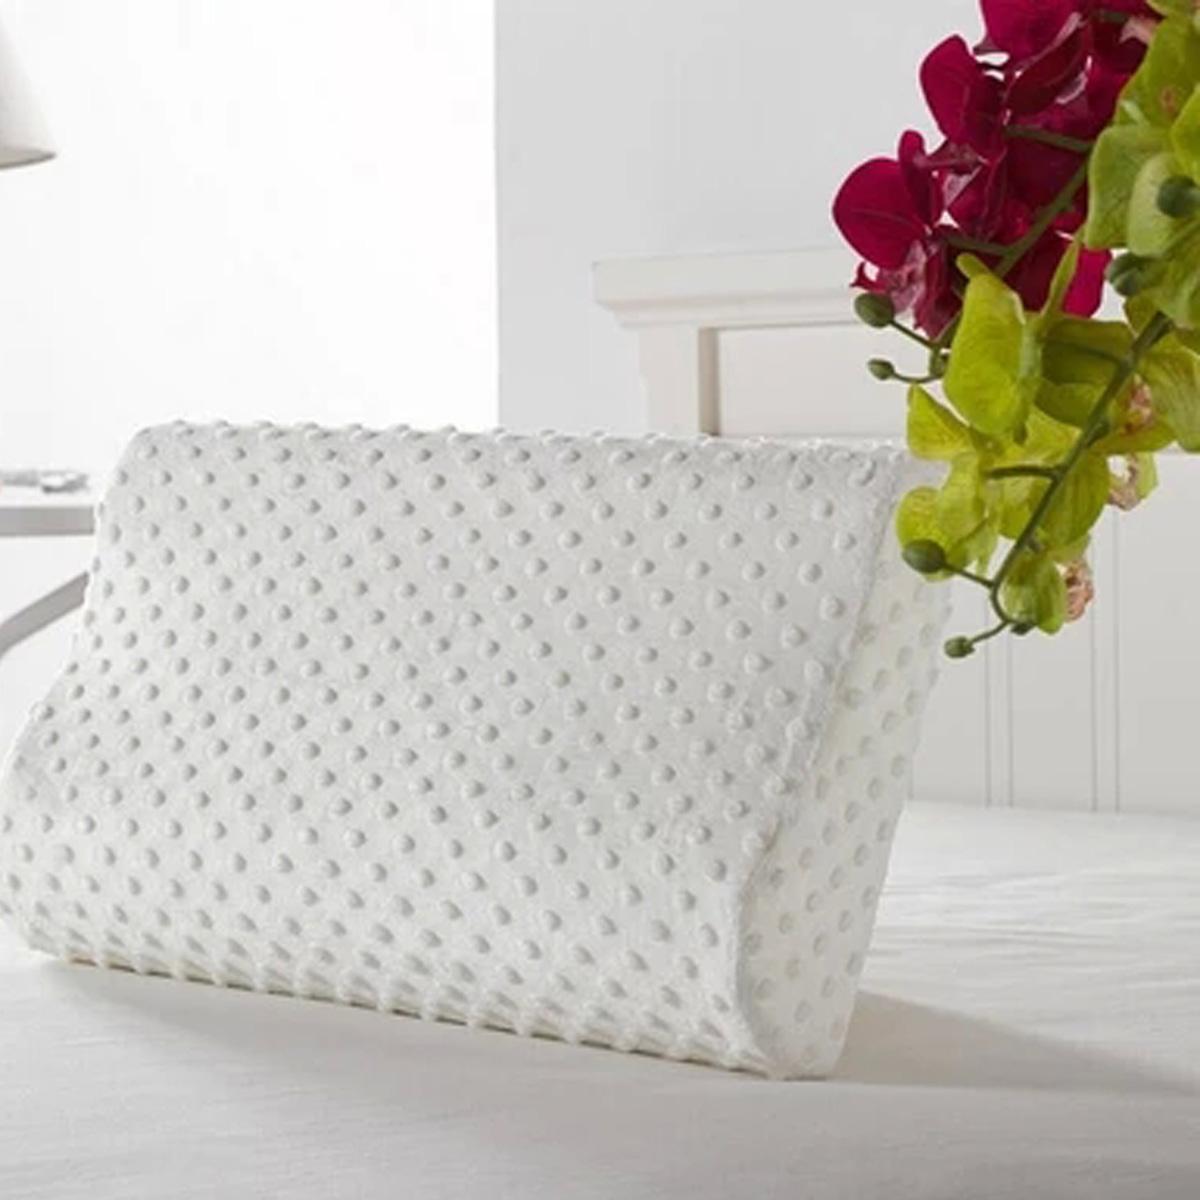 orthopaedic memory foam contour pillow firm head neck health